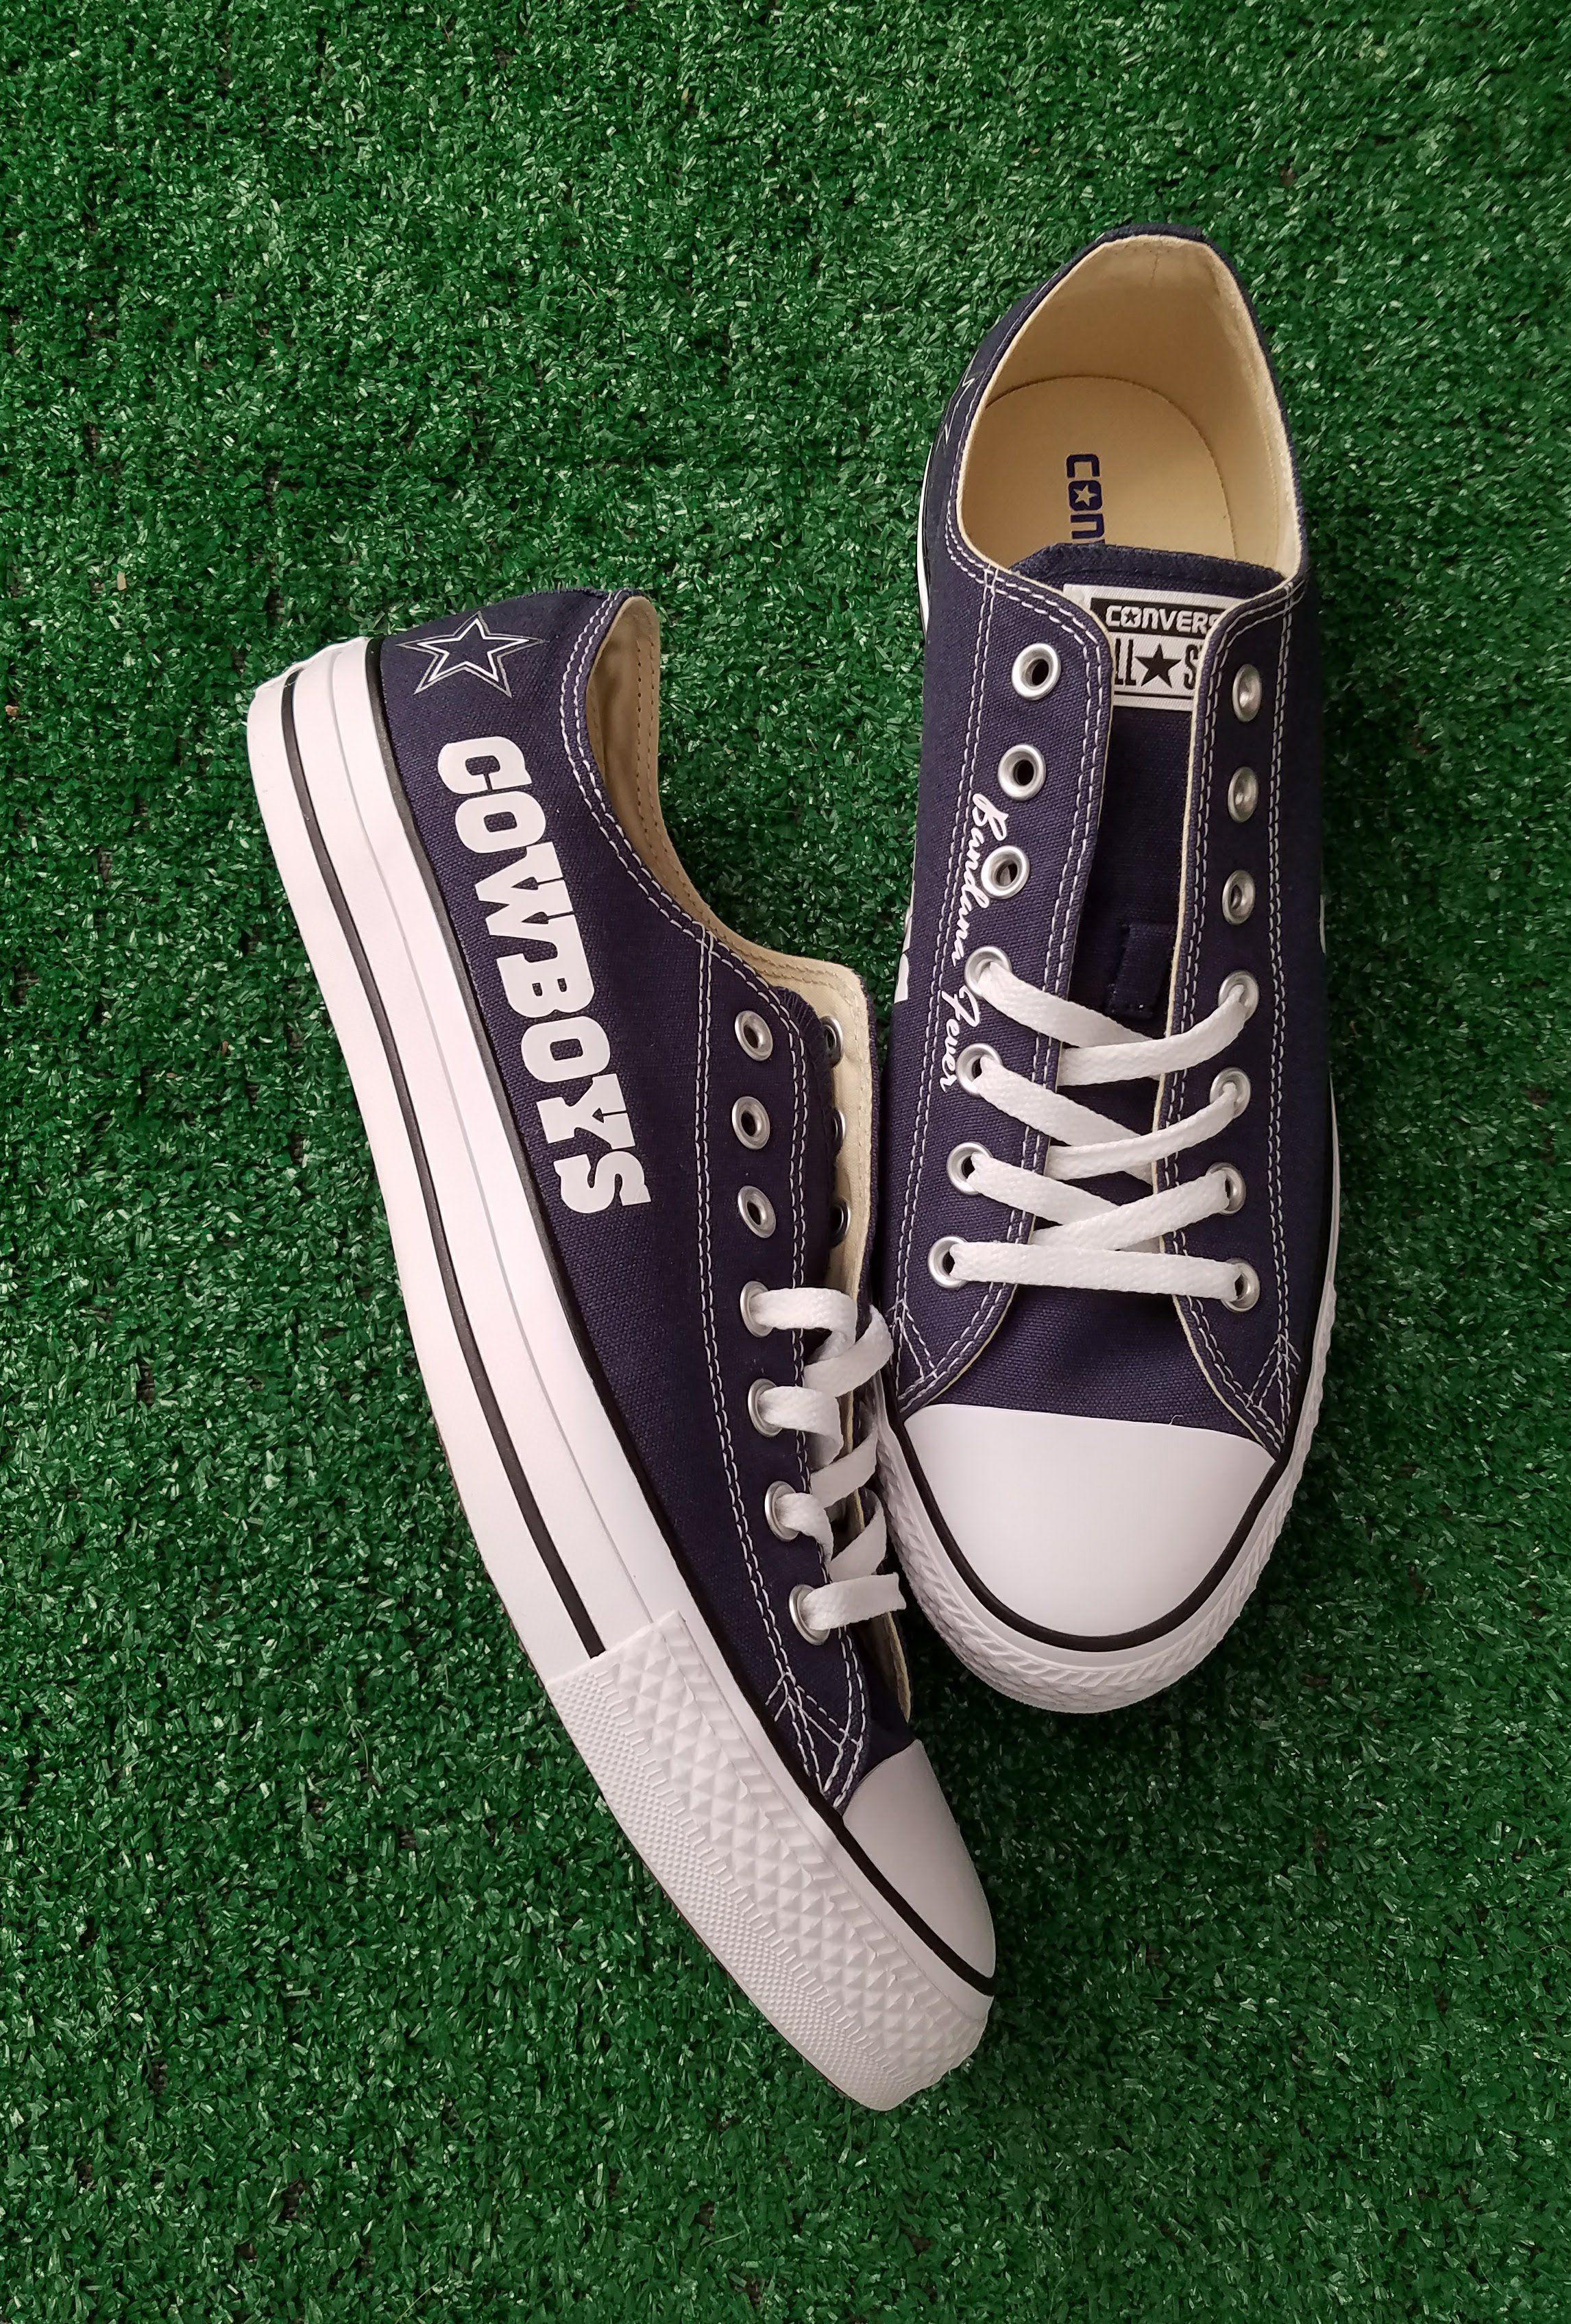 31c6ae9ea96240 Bandana Fever Dallas Cowboys Print Custom Navy Converse Low Top Shoes   sneakers  explorepage